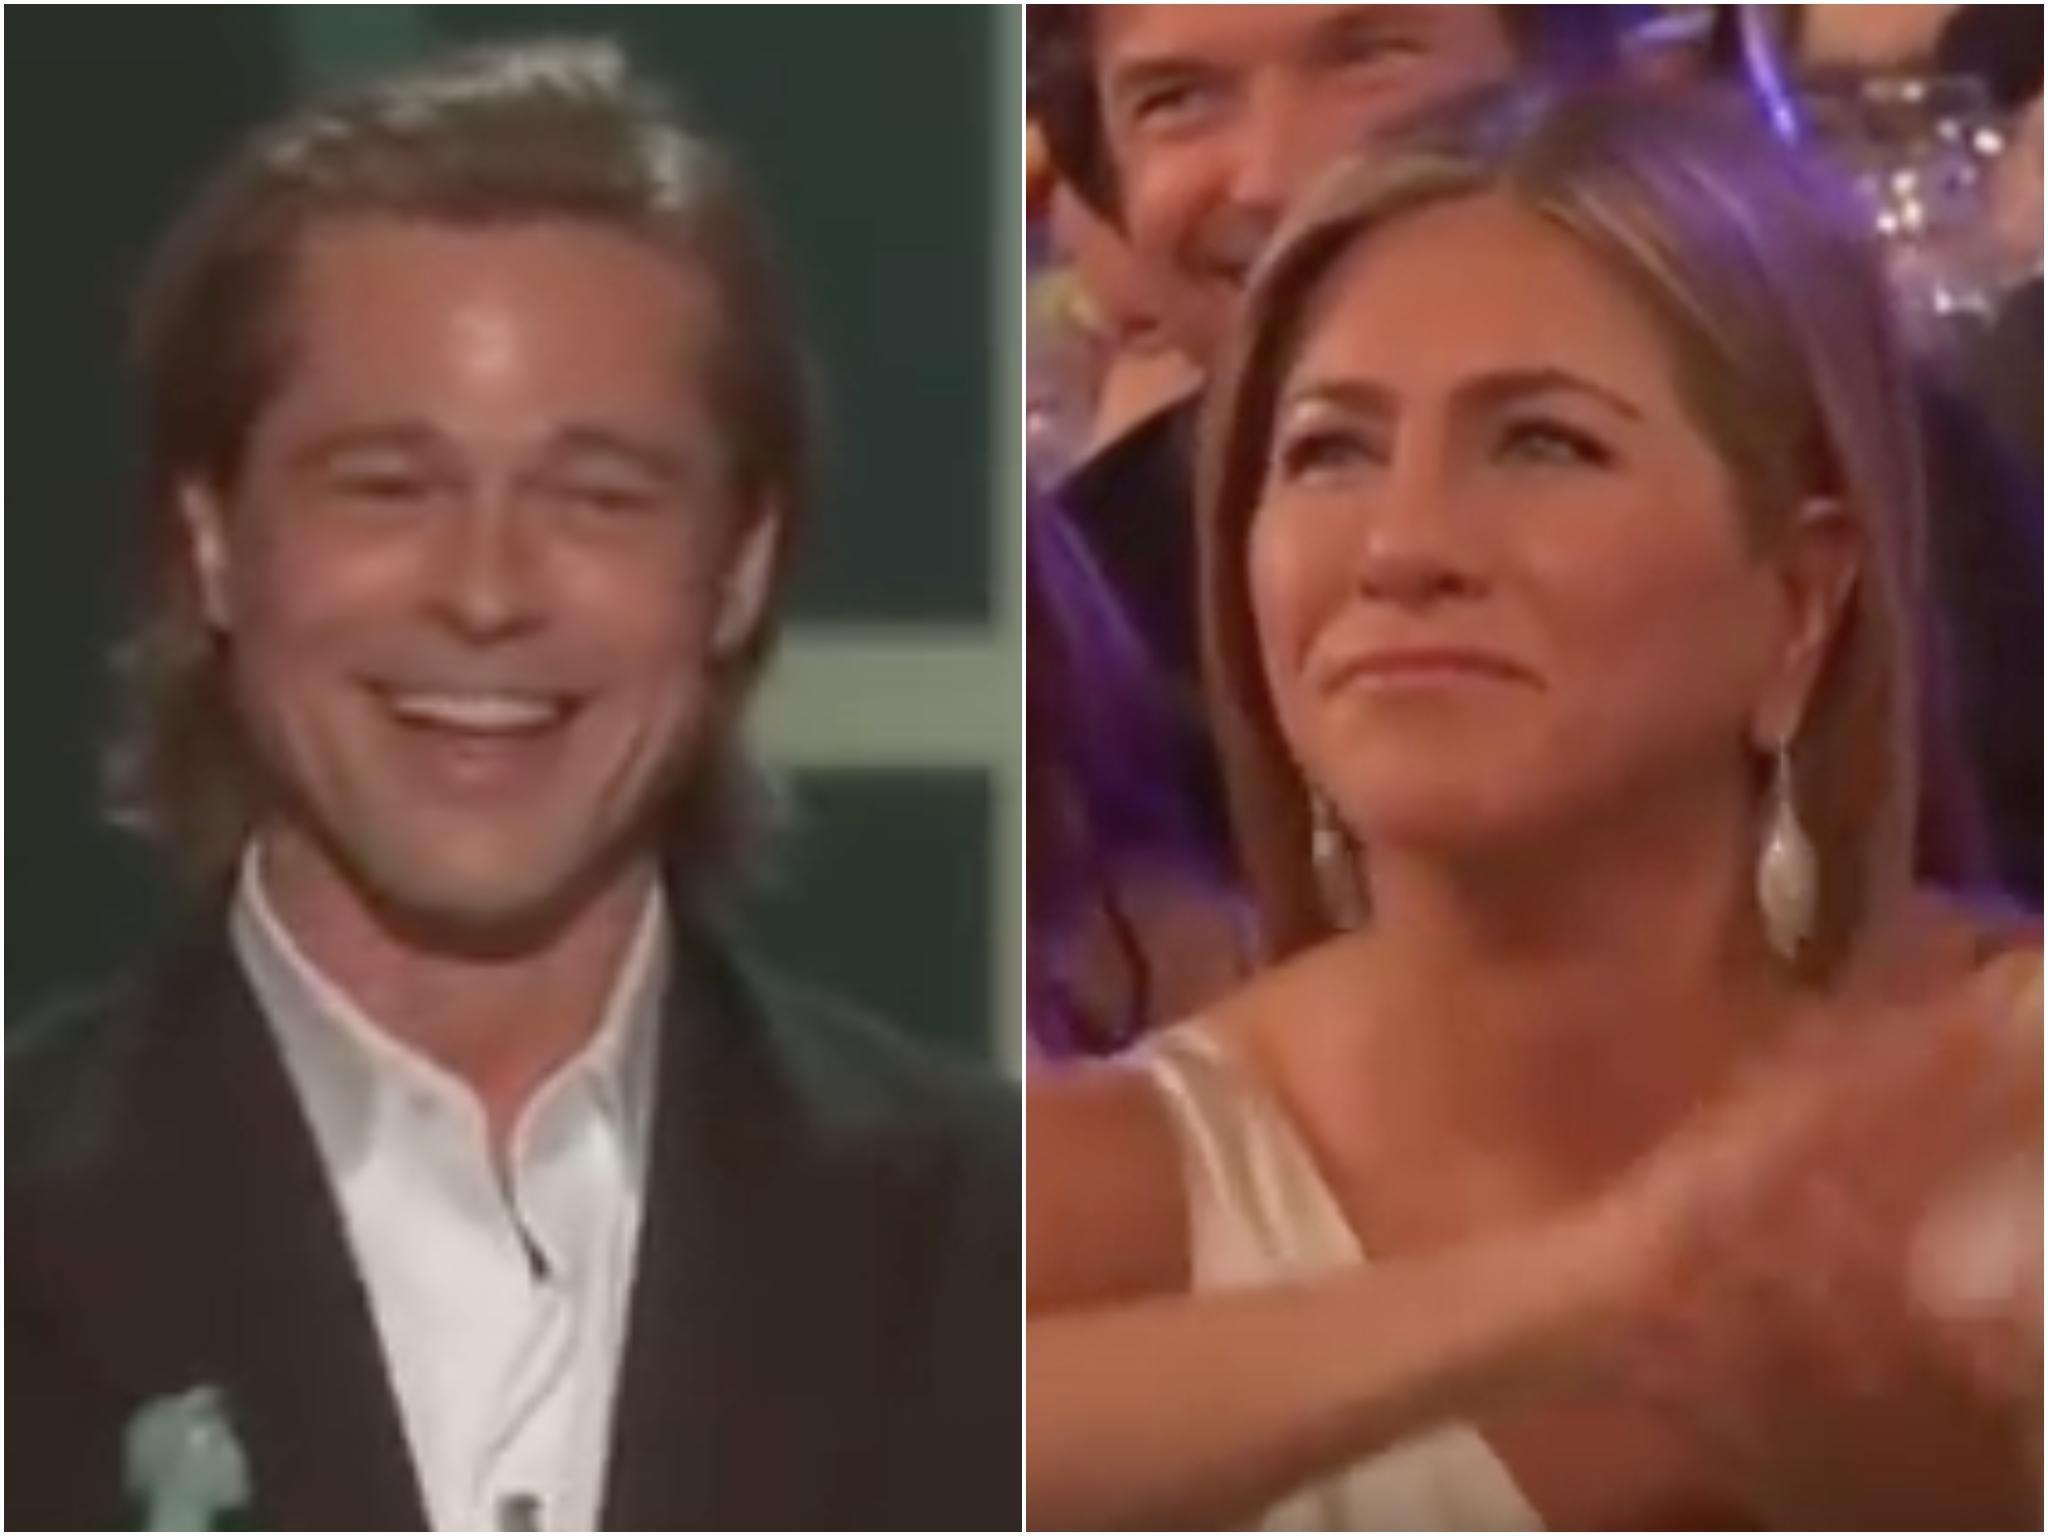 Brad Pitt jokes about failed marriages in SAG Awards speech as Jennifer Aniston watches on